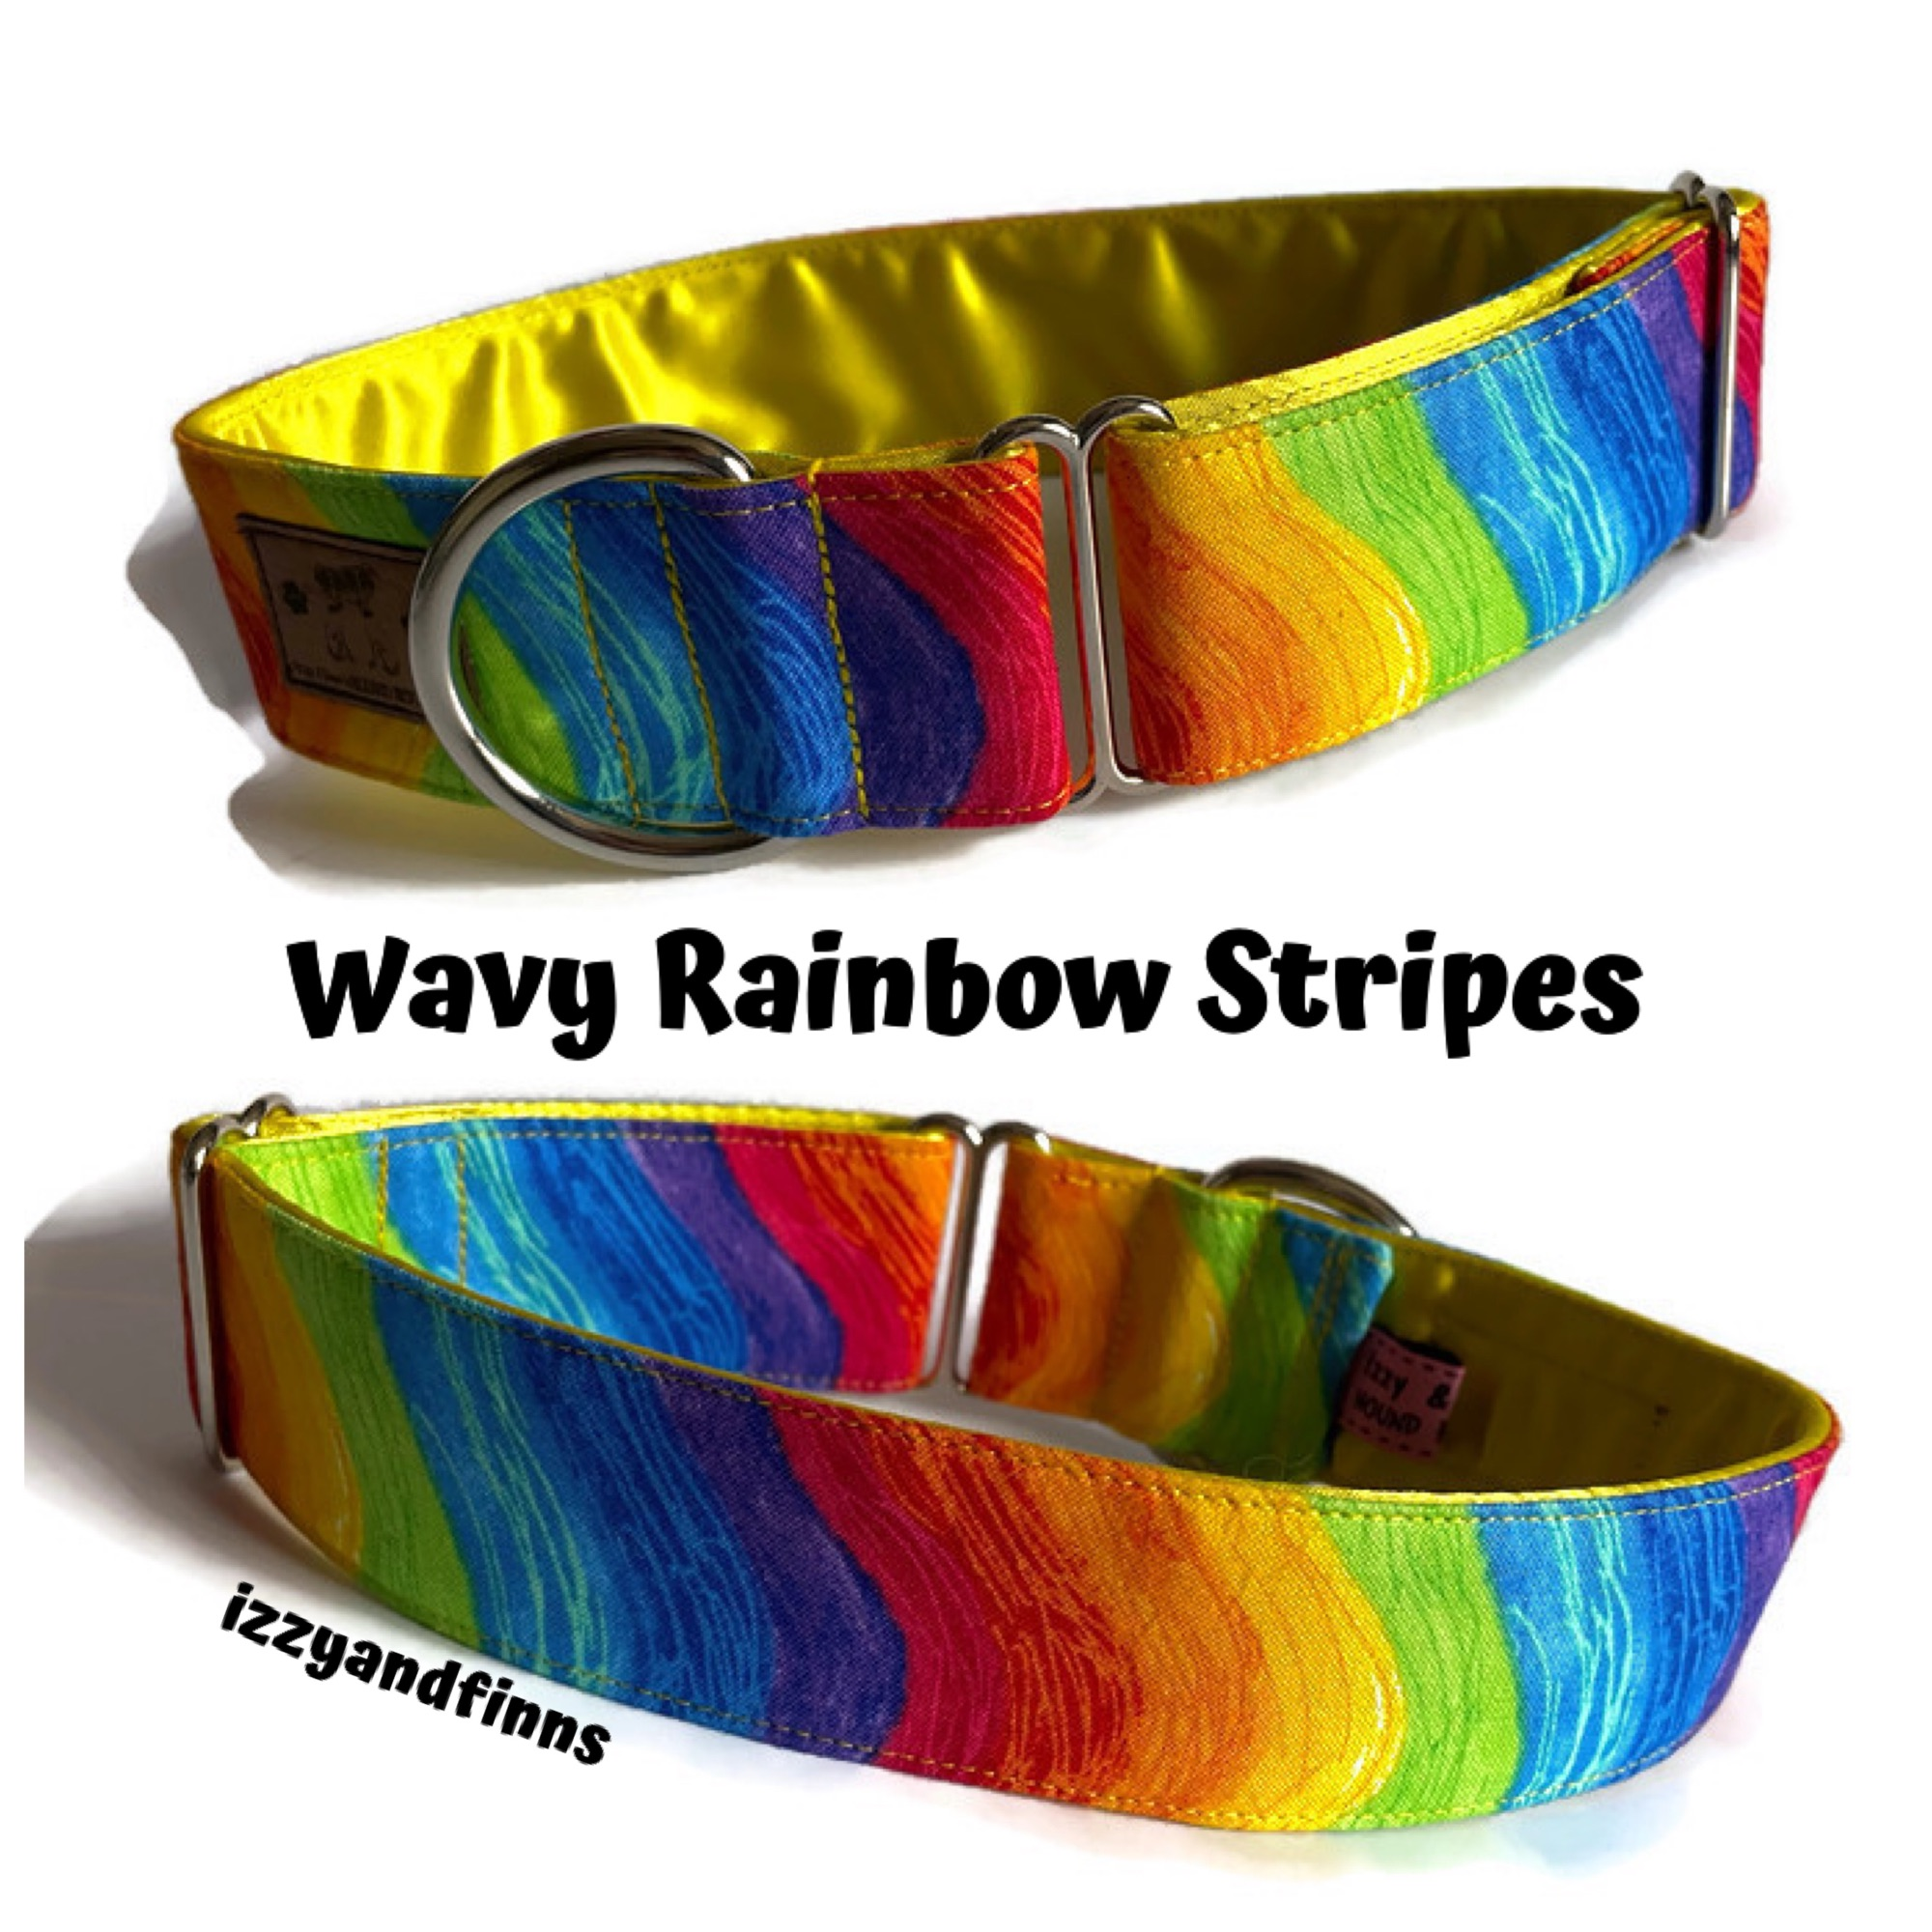 wavy rainbow stripes collar